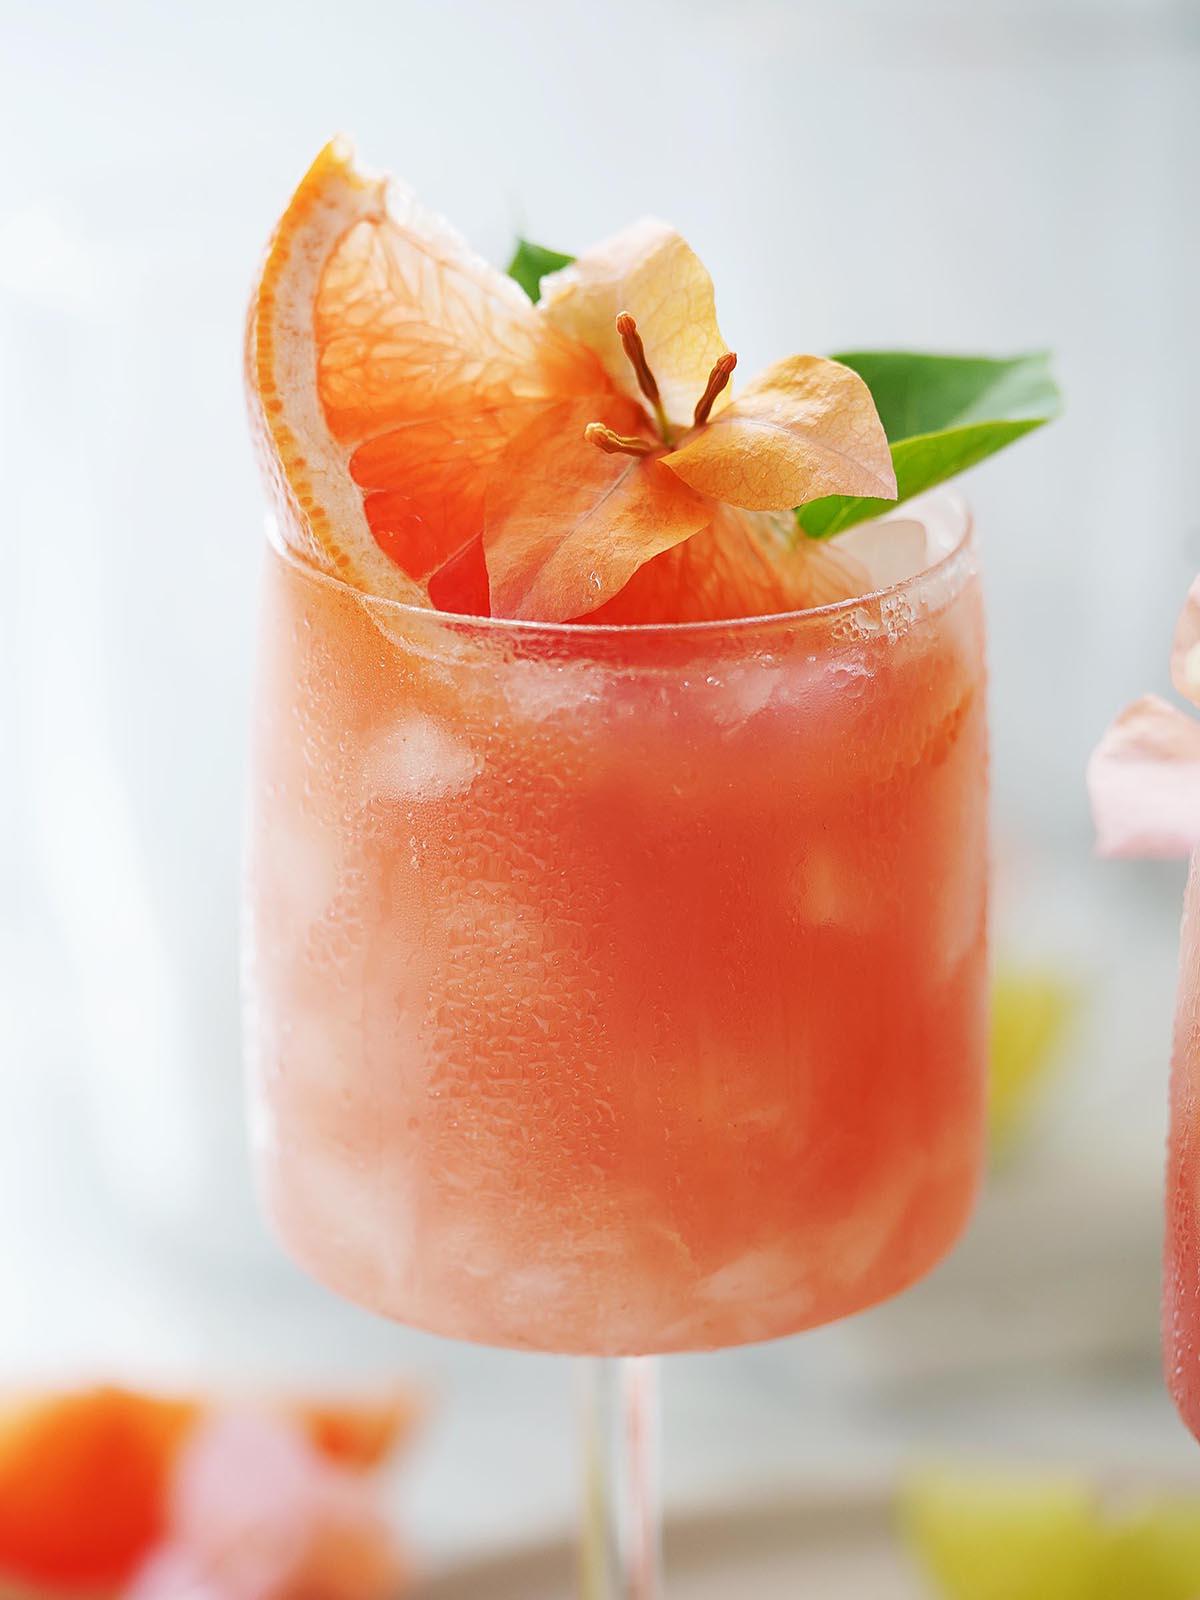 An orange drink garnished with grapefruit and an orange flower.